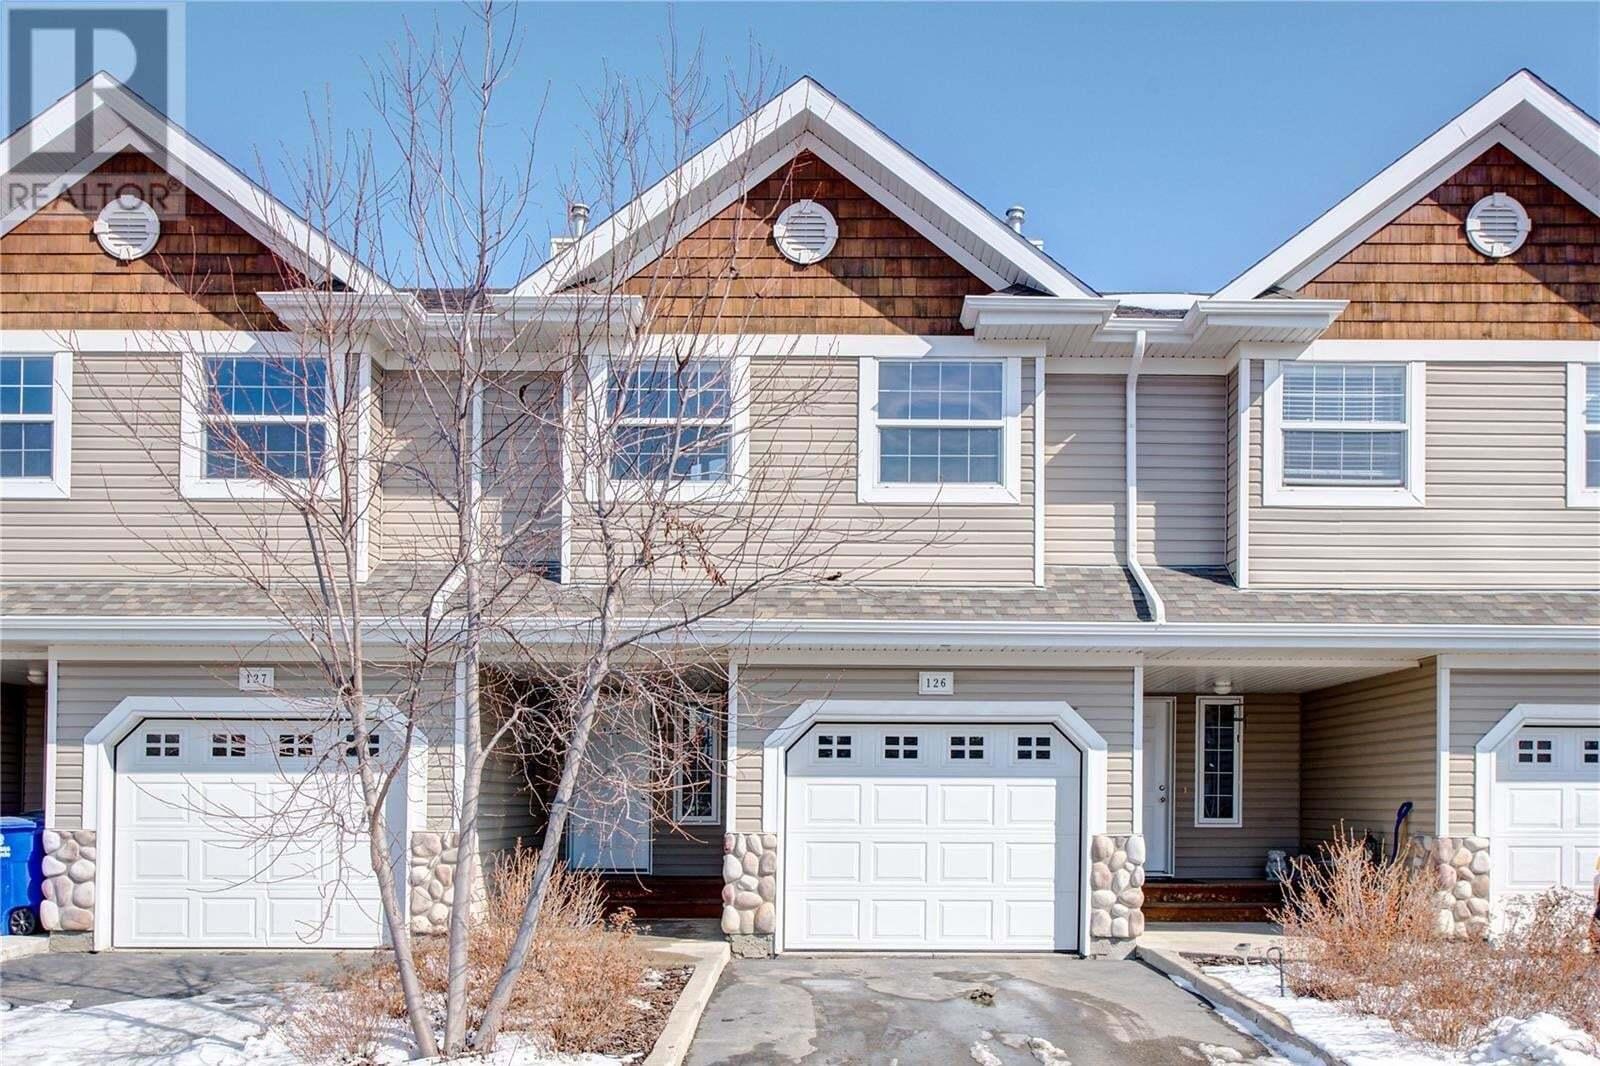 Townhouse for sale at 655 Kenderdine Rd Unit 126 Saskatoon Saskatchewan - MLS: SK809083